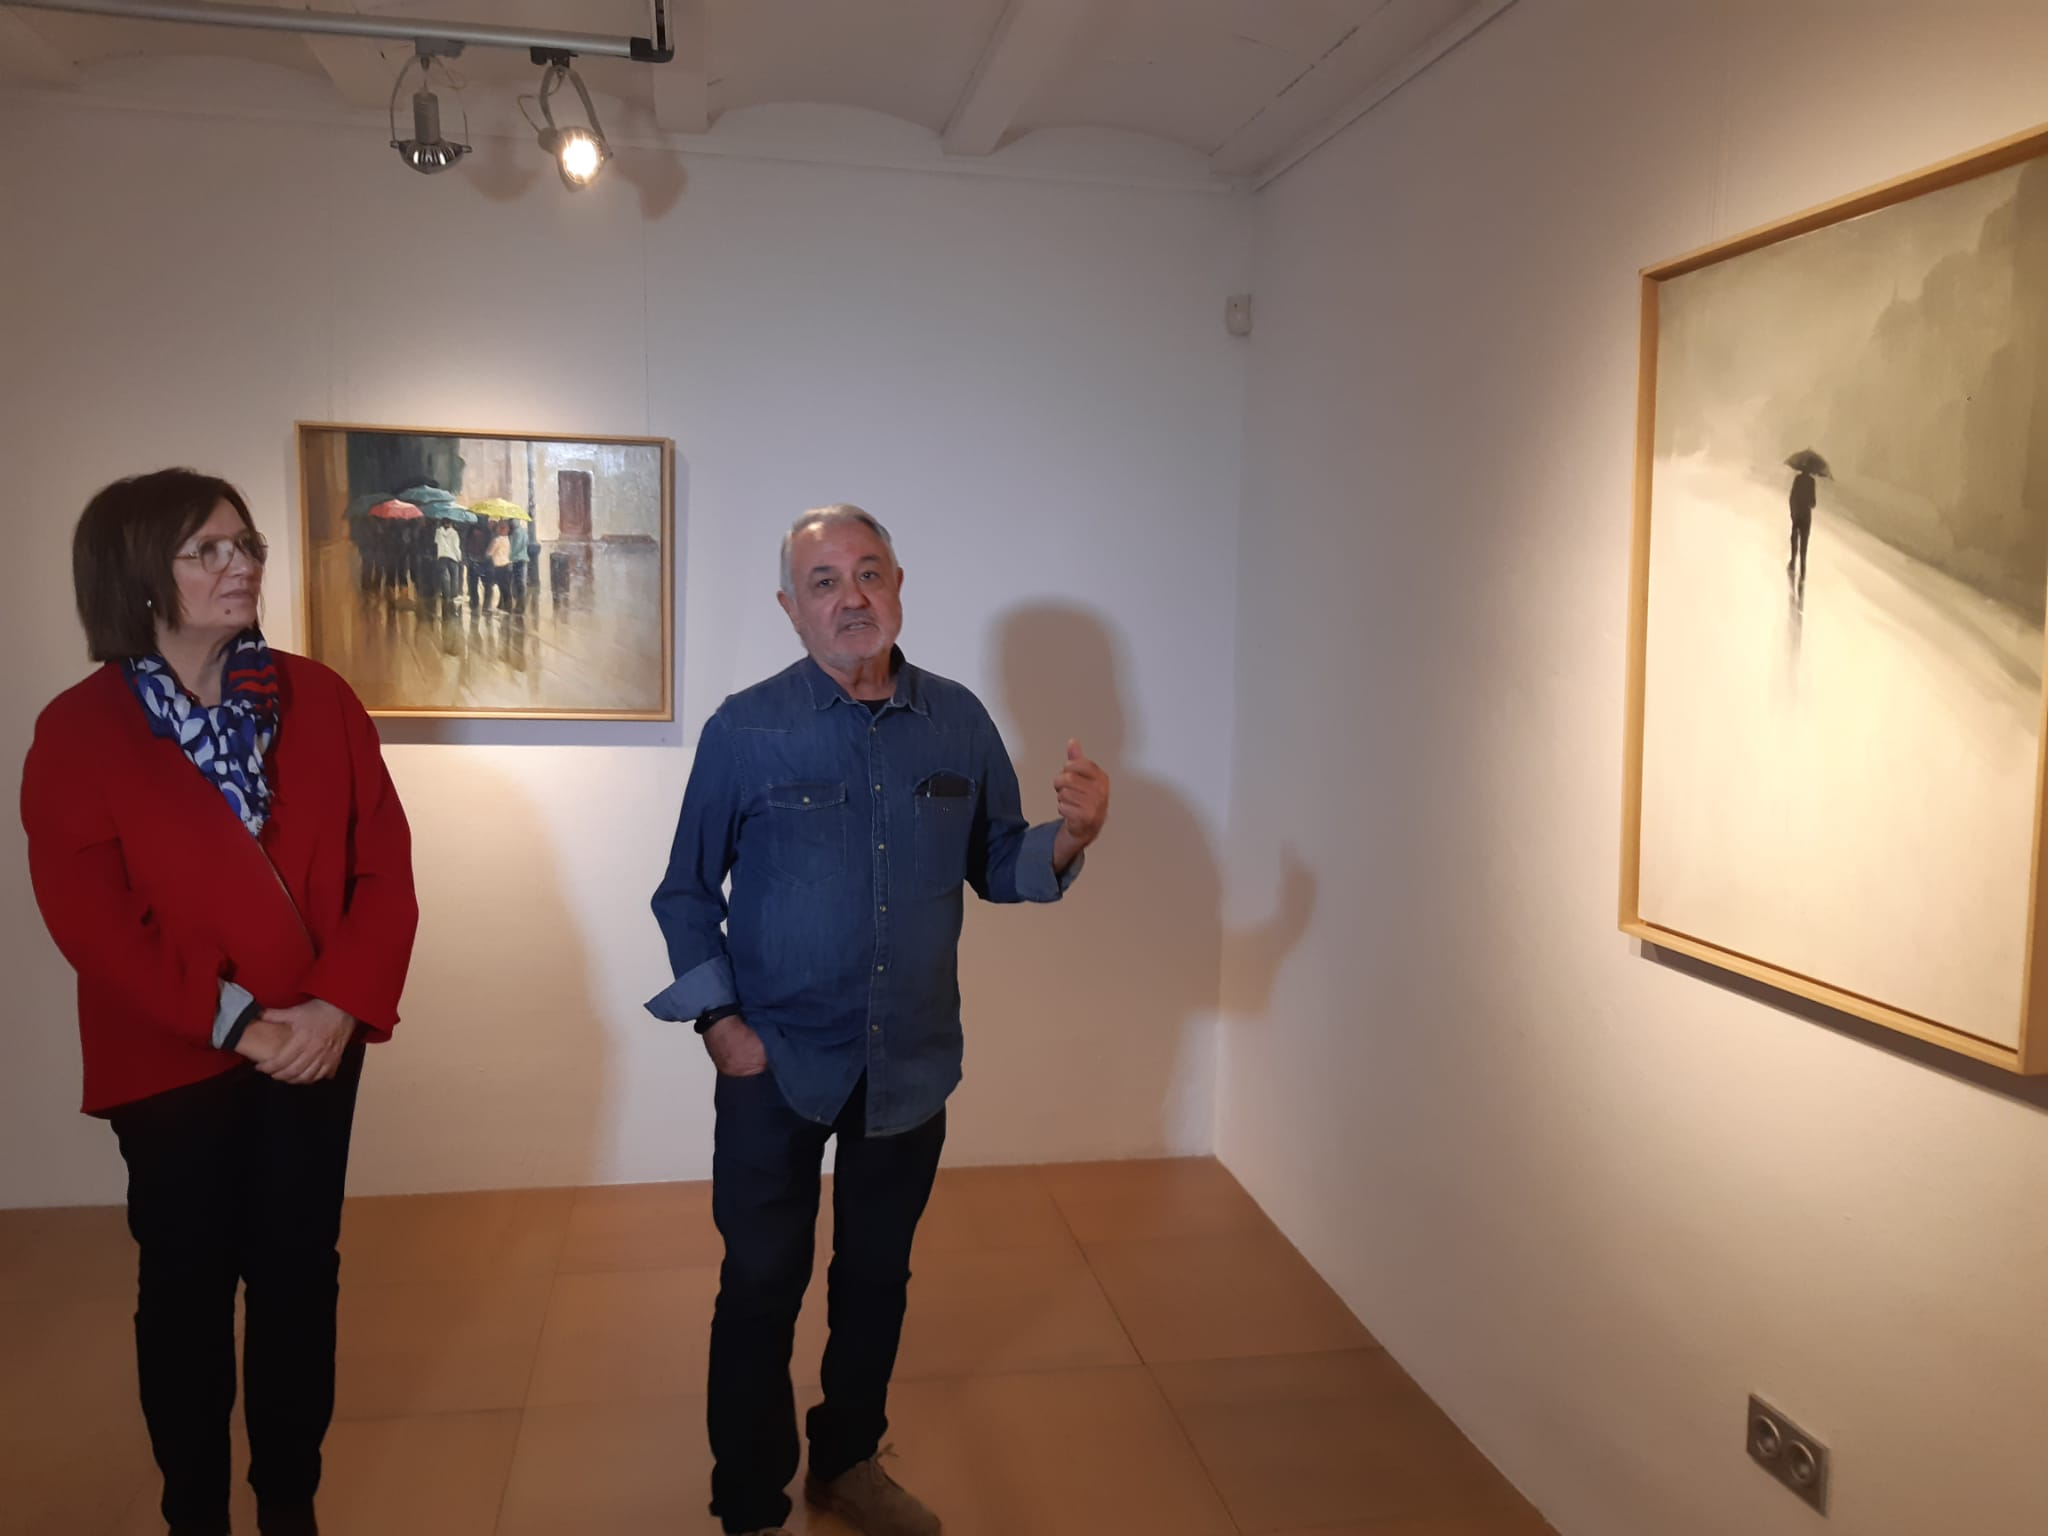 Benicarló; L'Obra de Nicolás Caballero arriba al Mucbe amb 'Acentos de color'